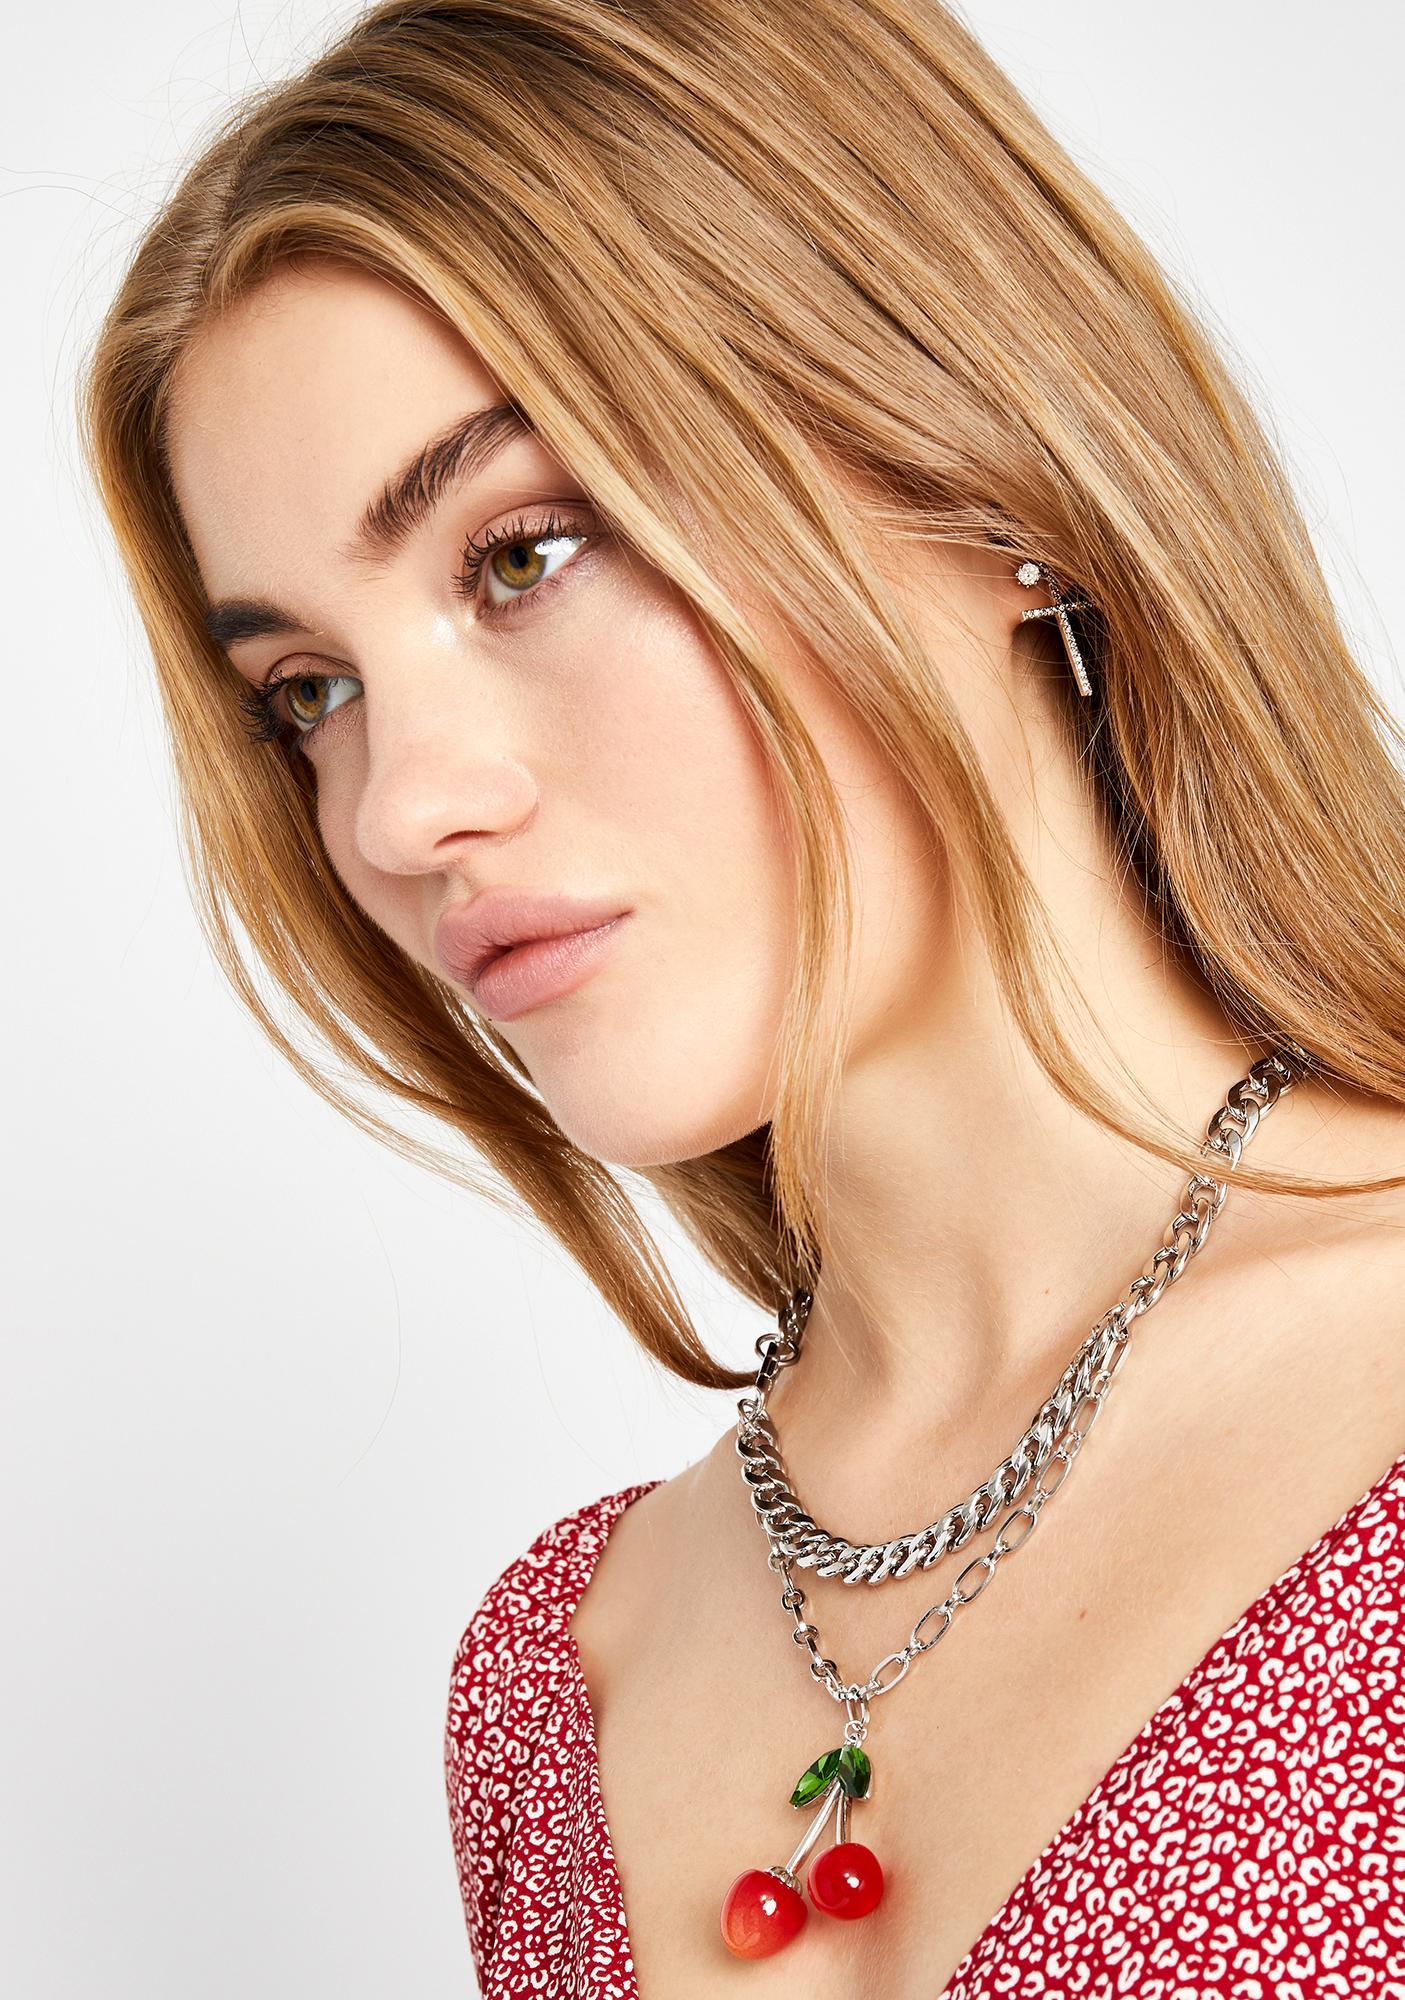 Pop It Baby Cherry Necklace